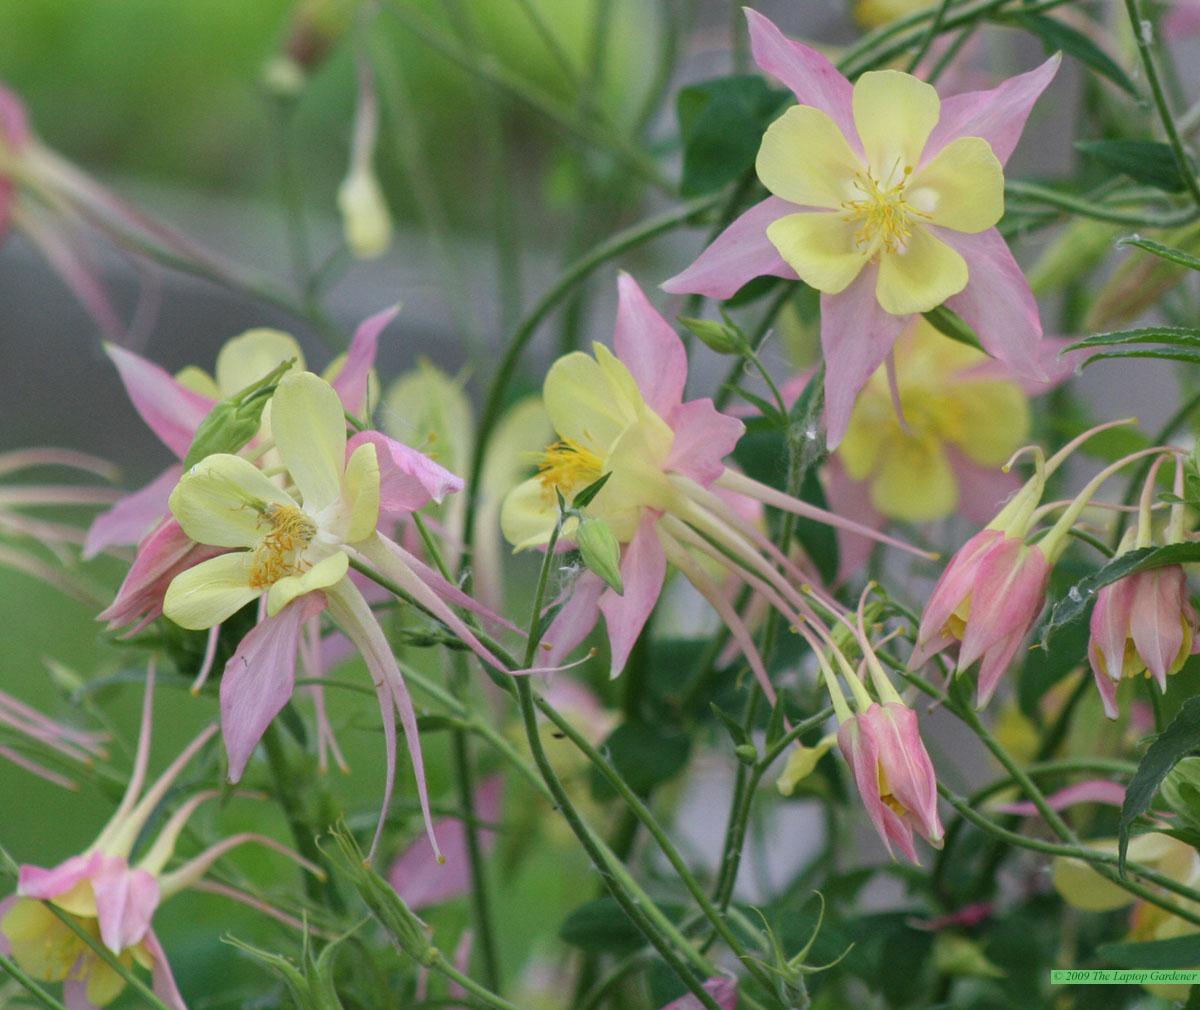 Perennials for Attracting Wildlife The Laptop Gardener